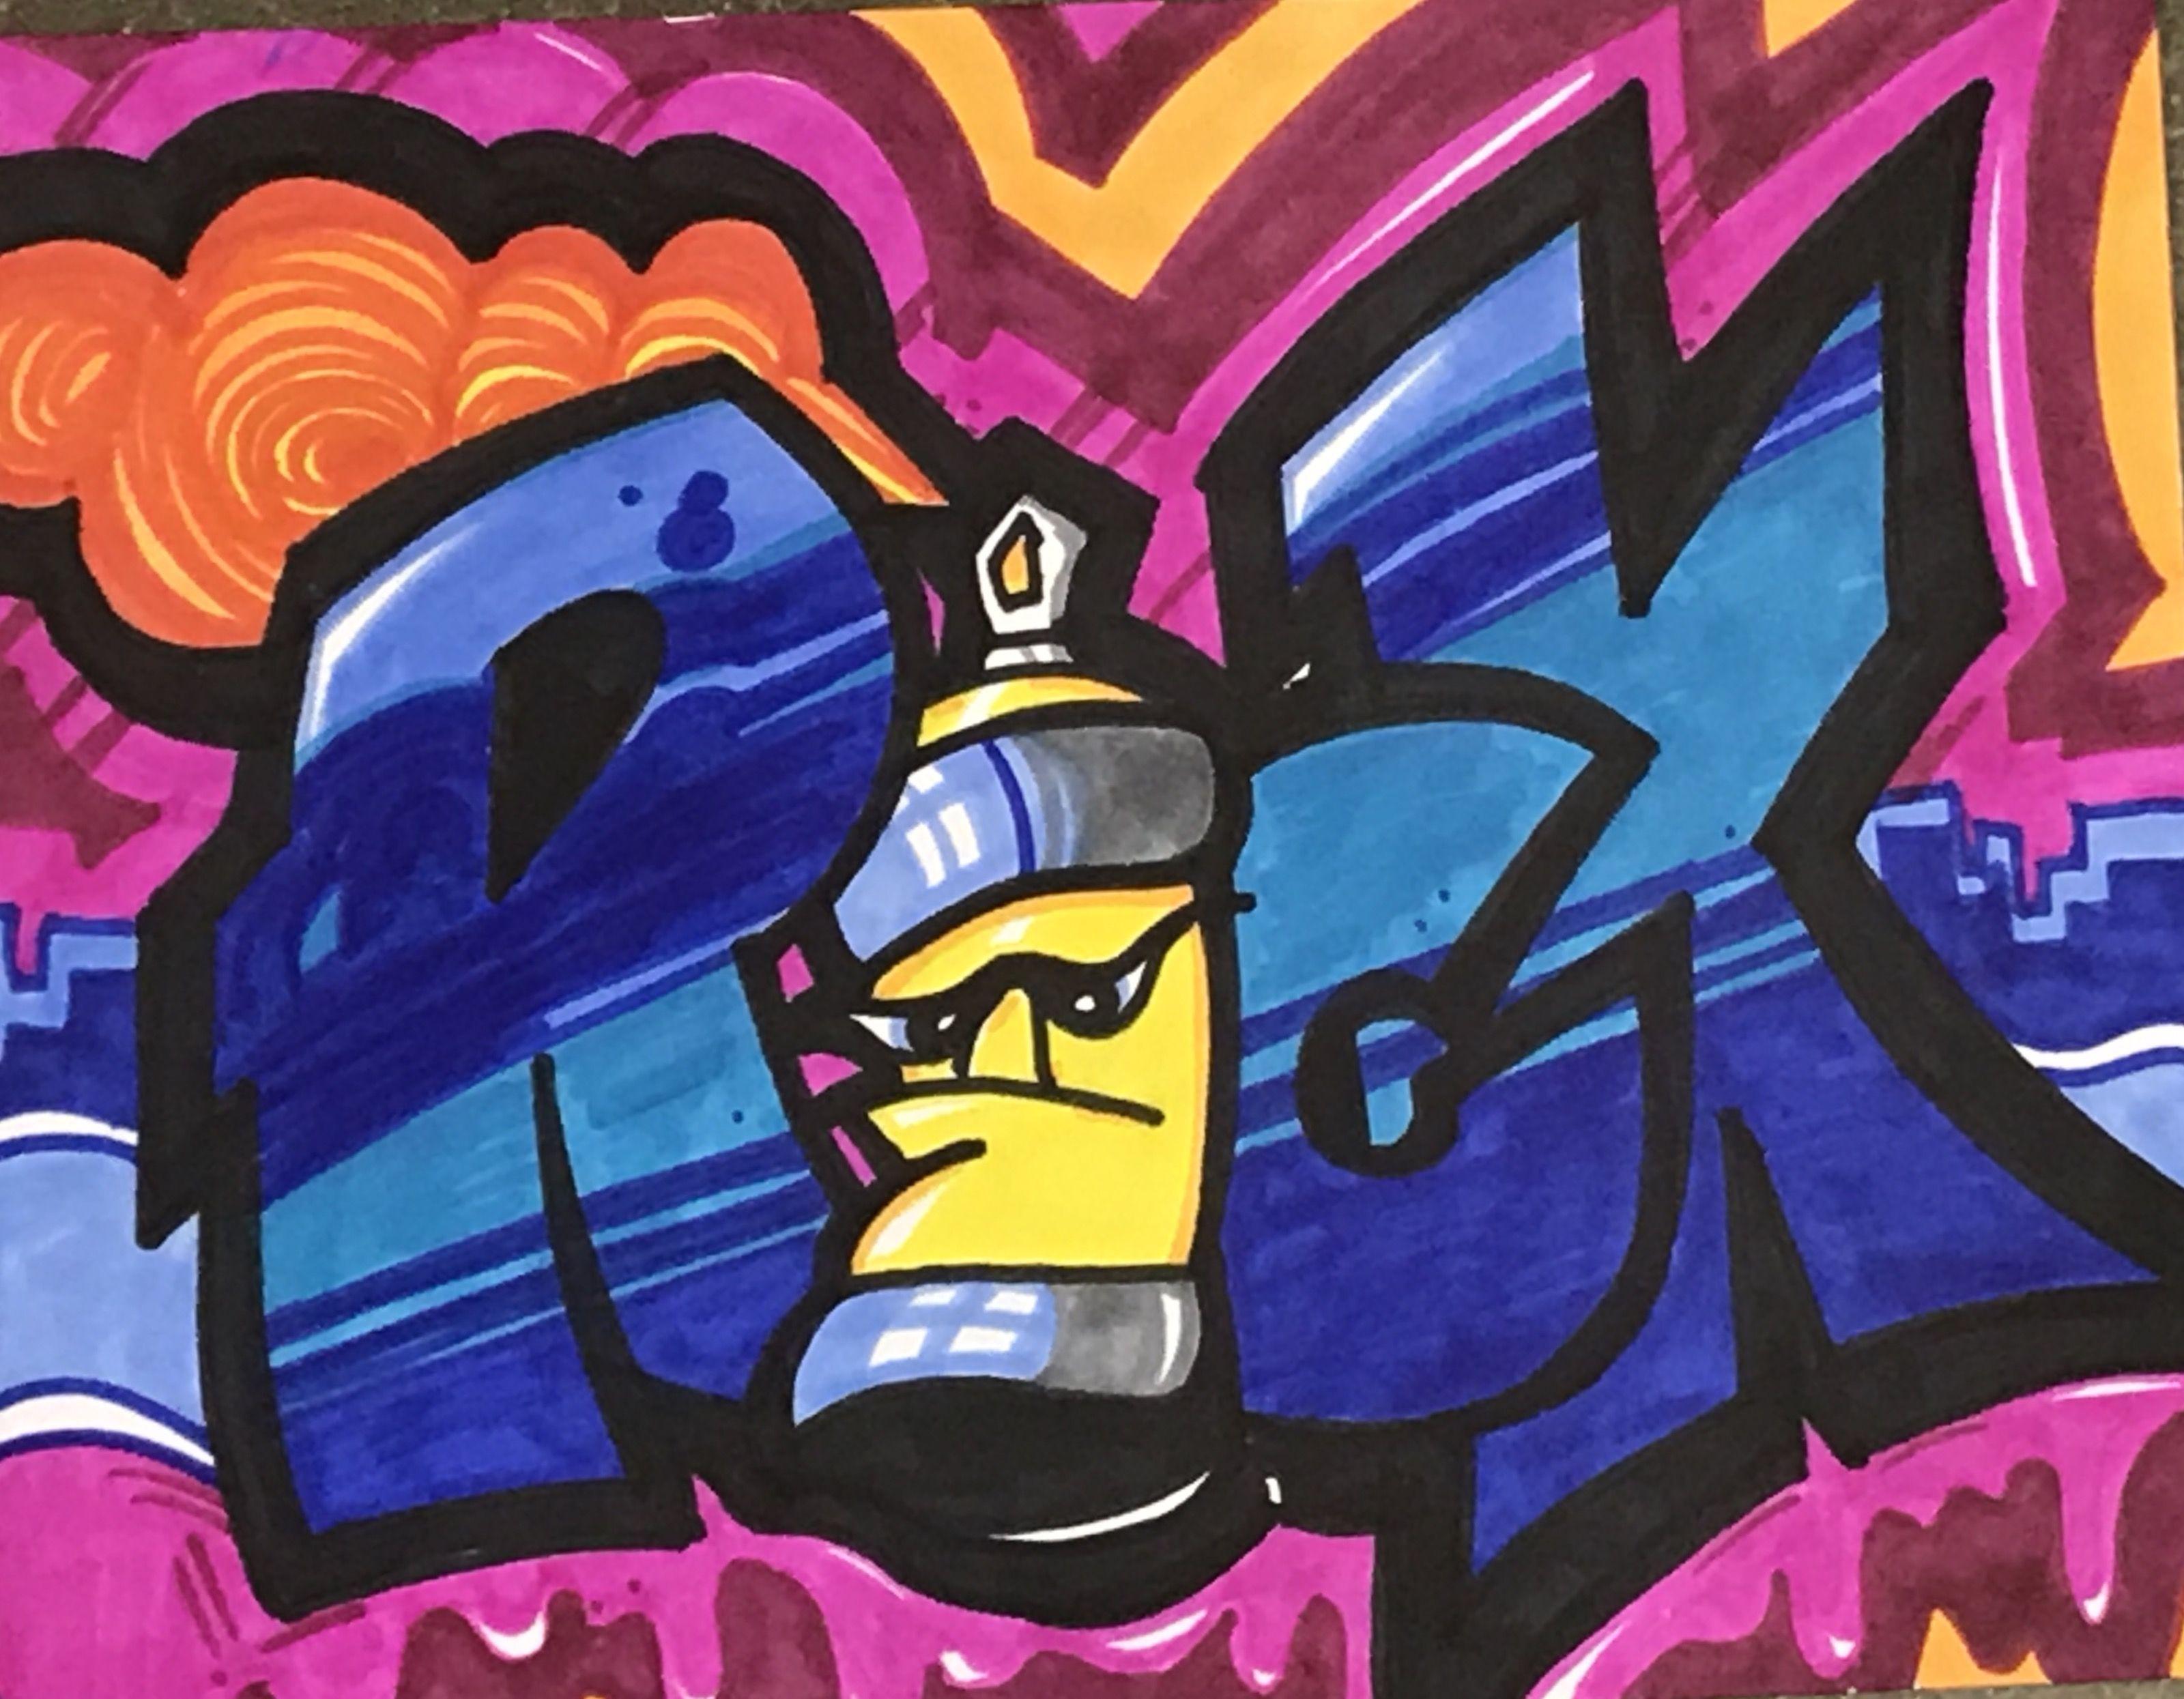 Graffiti name art rick by graffiti art lesson at corsicana middle school in corsicana texas